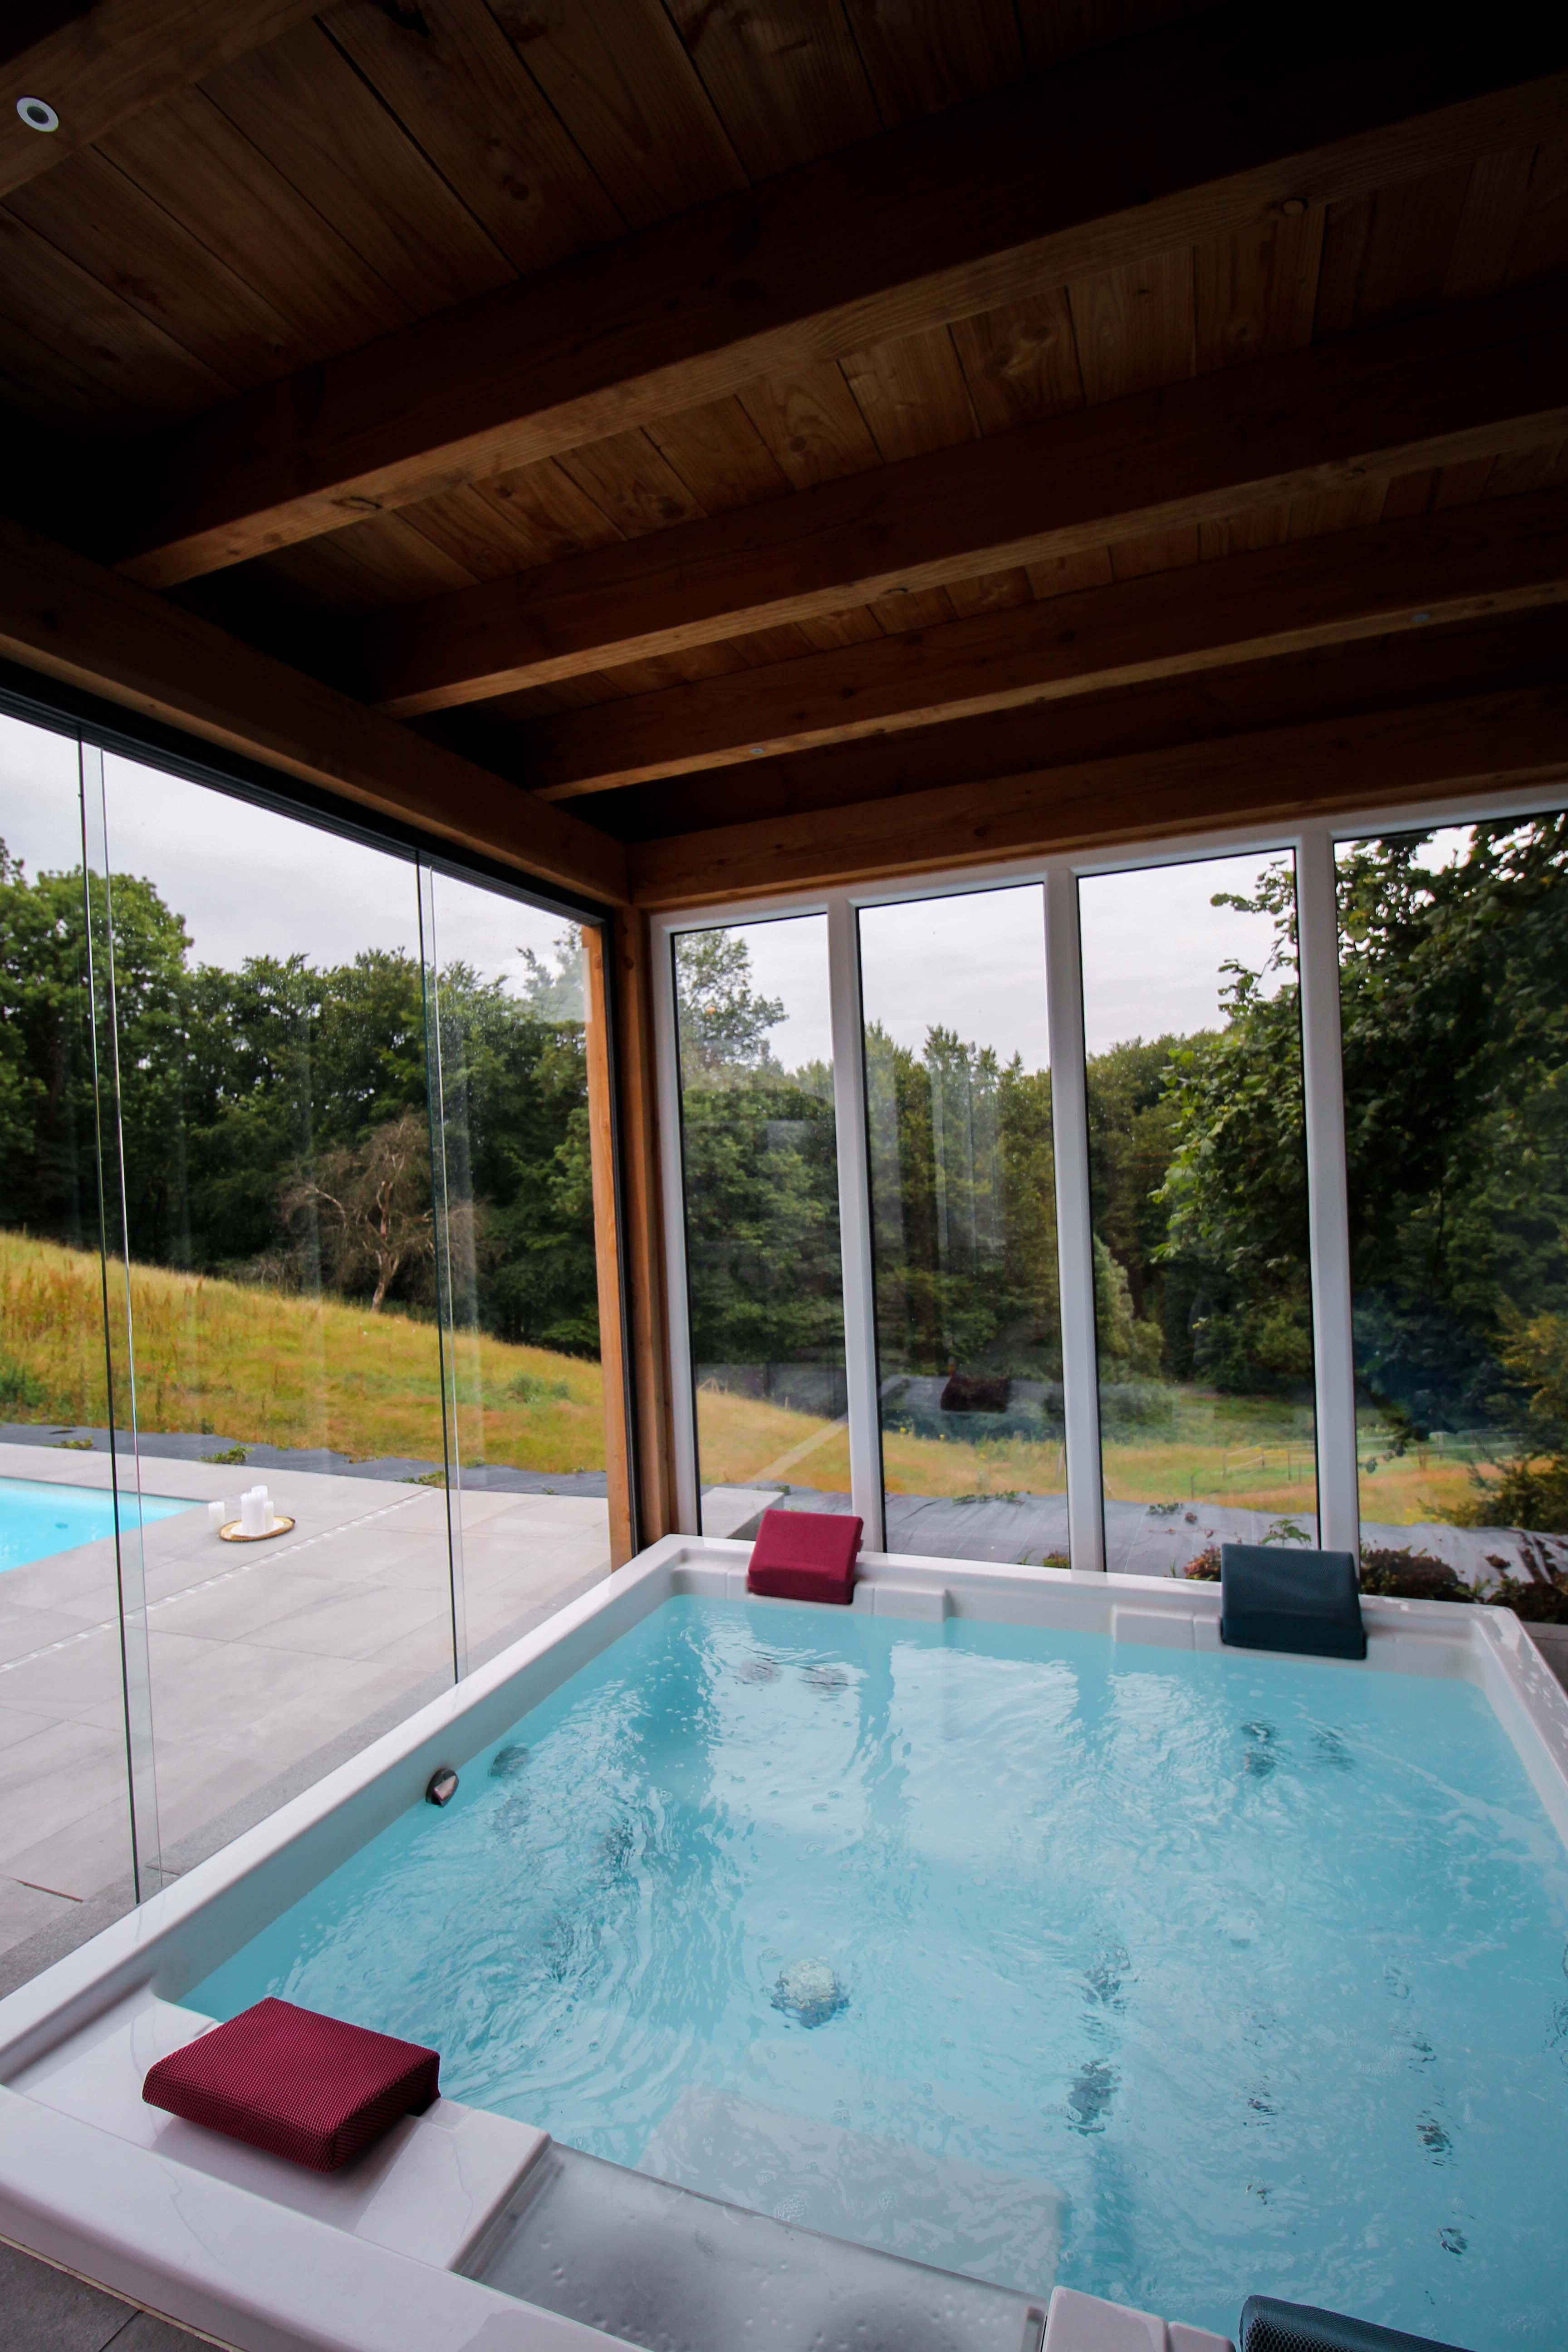 Geburtstagsfeier Location Villa Eifel Deutschland besondere Location JGA Villa mieten Muxerath Villa Steinshof Hasenhof Whirlpool